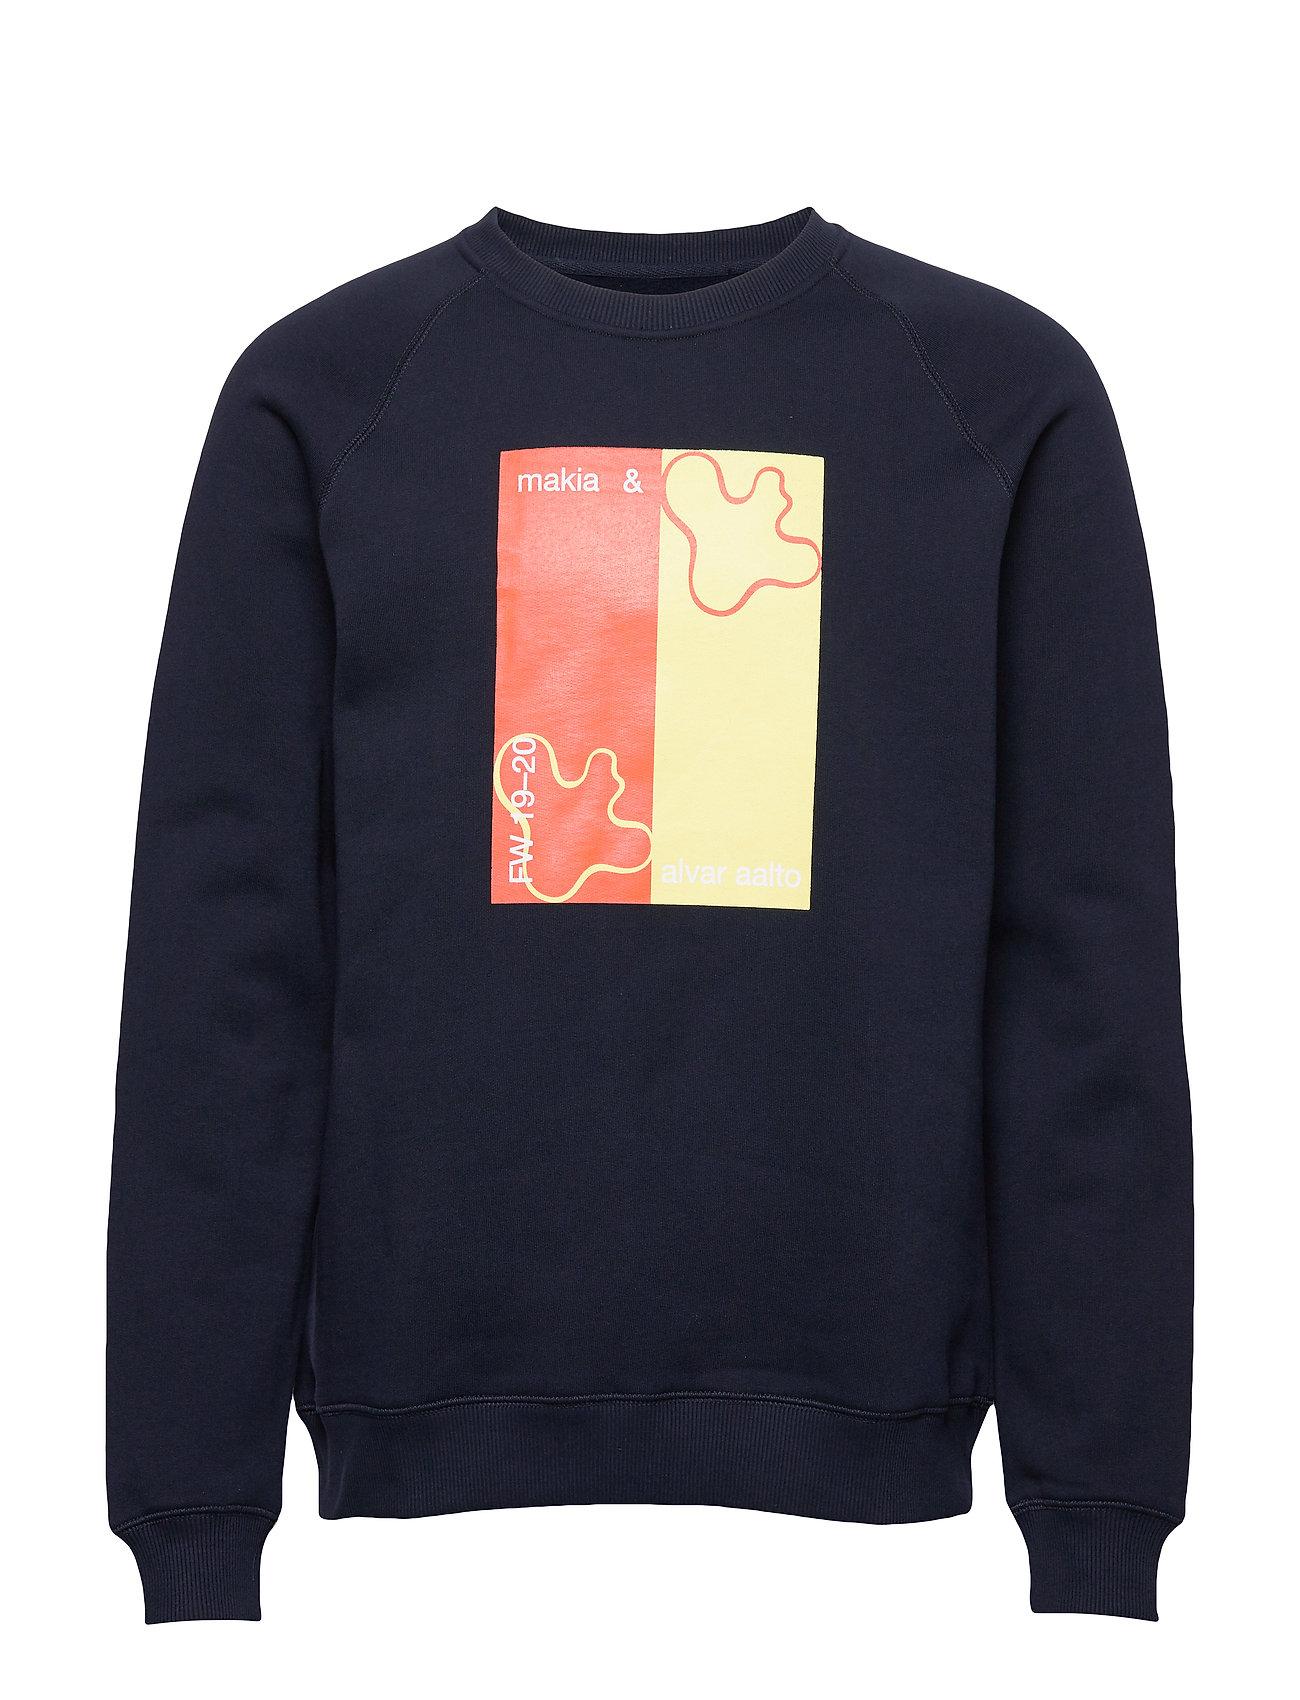 Makia Lines Sweatshirt - DARK BLUE